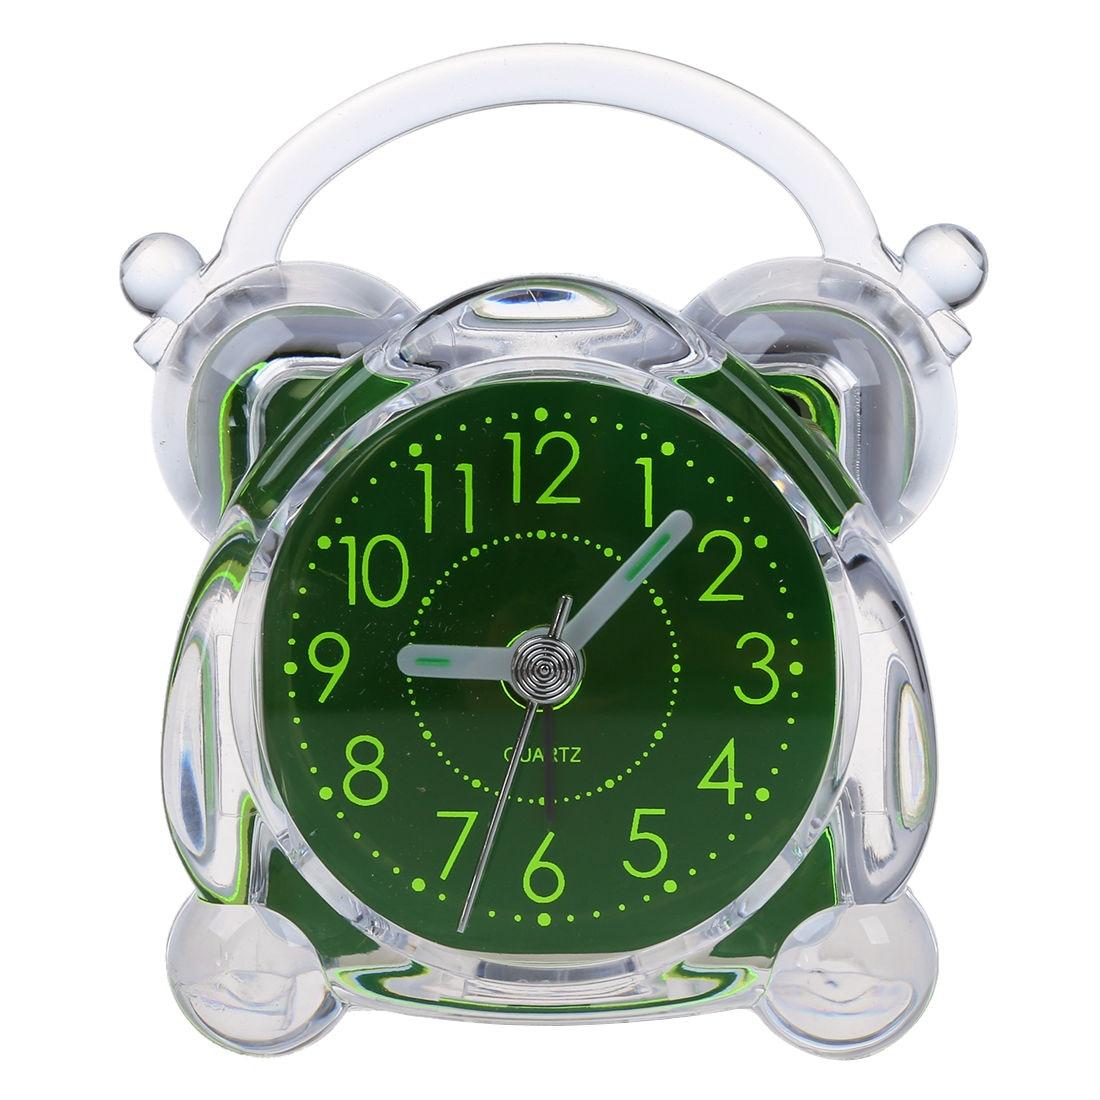 Small Crystal Plastic Desk Bell Alarm Clock with Light